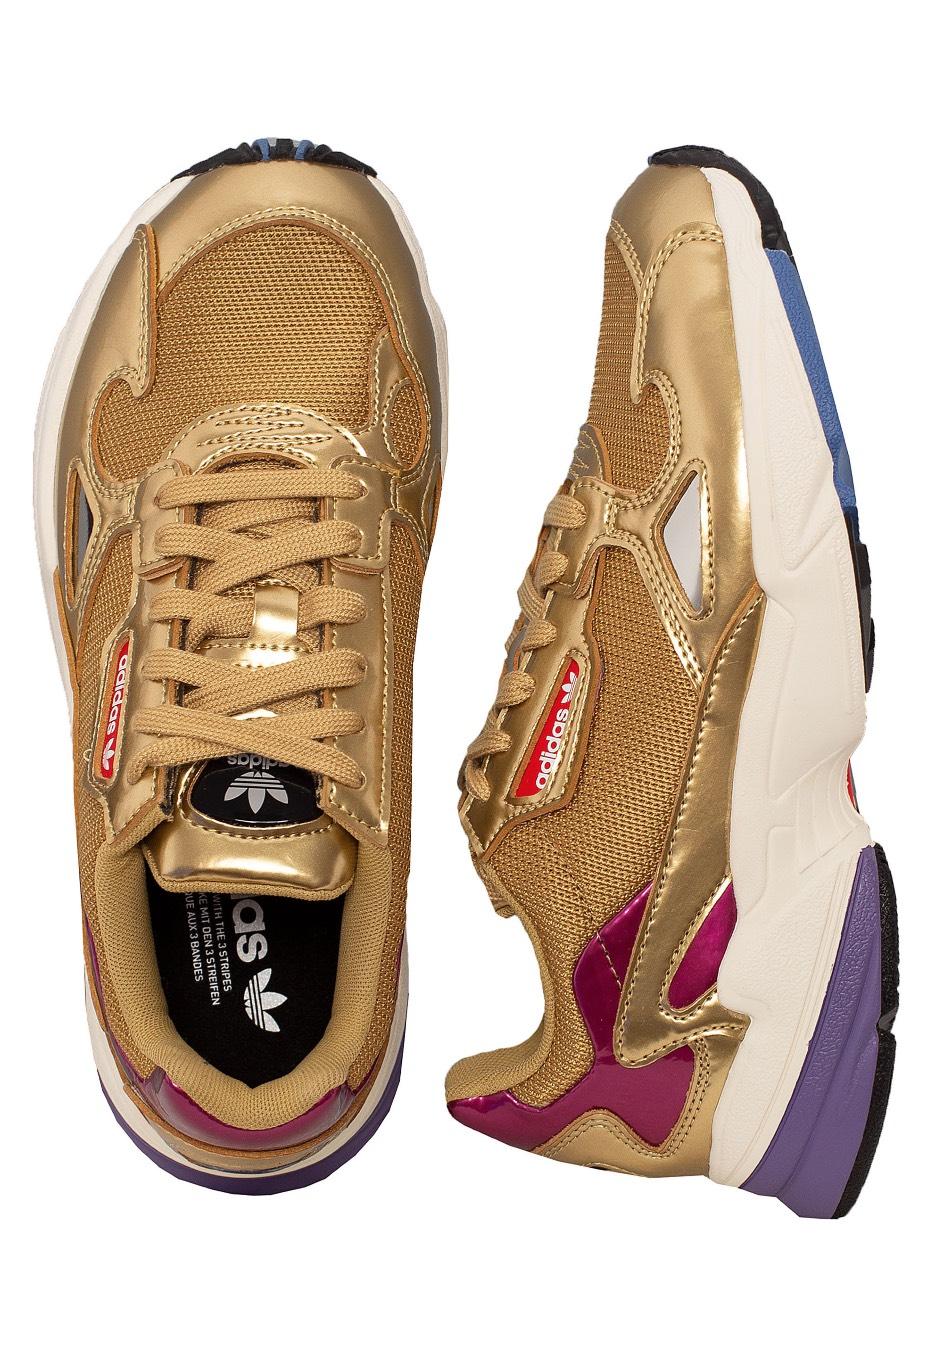 Adidas - Falcon W Gold Metallic - Girl Shoes - Impericon.com US 7751df7a4b55